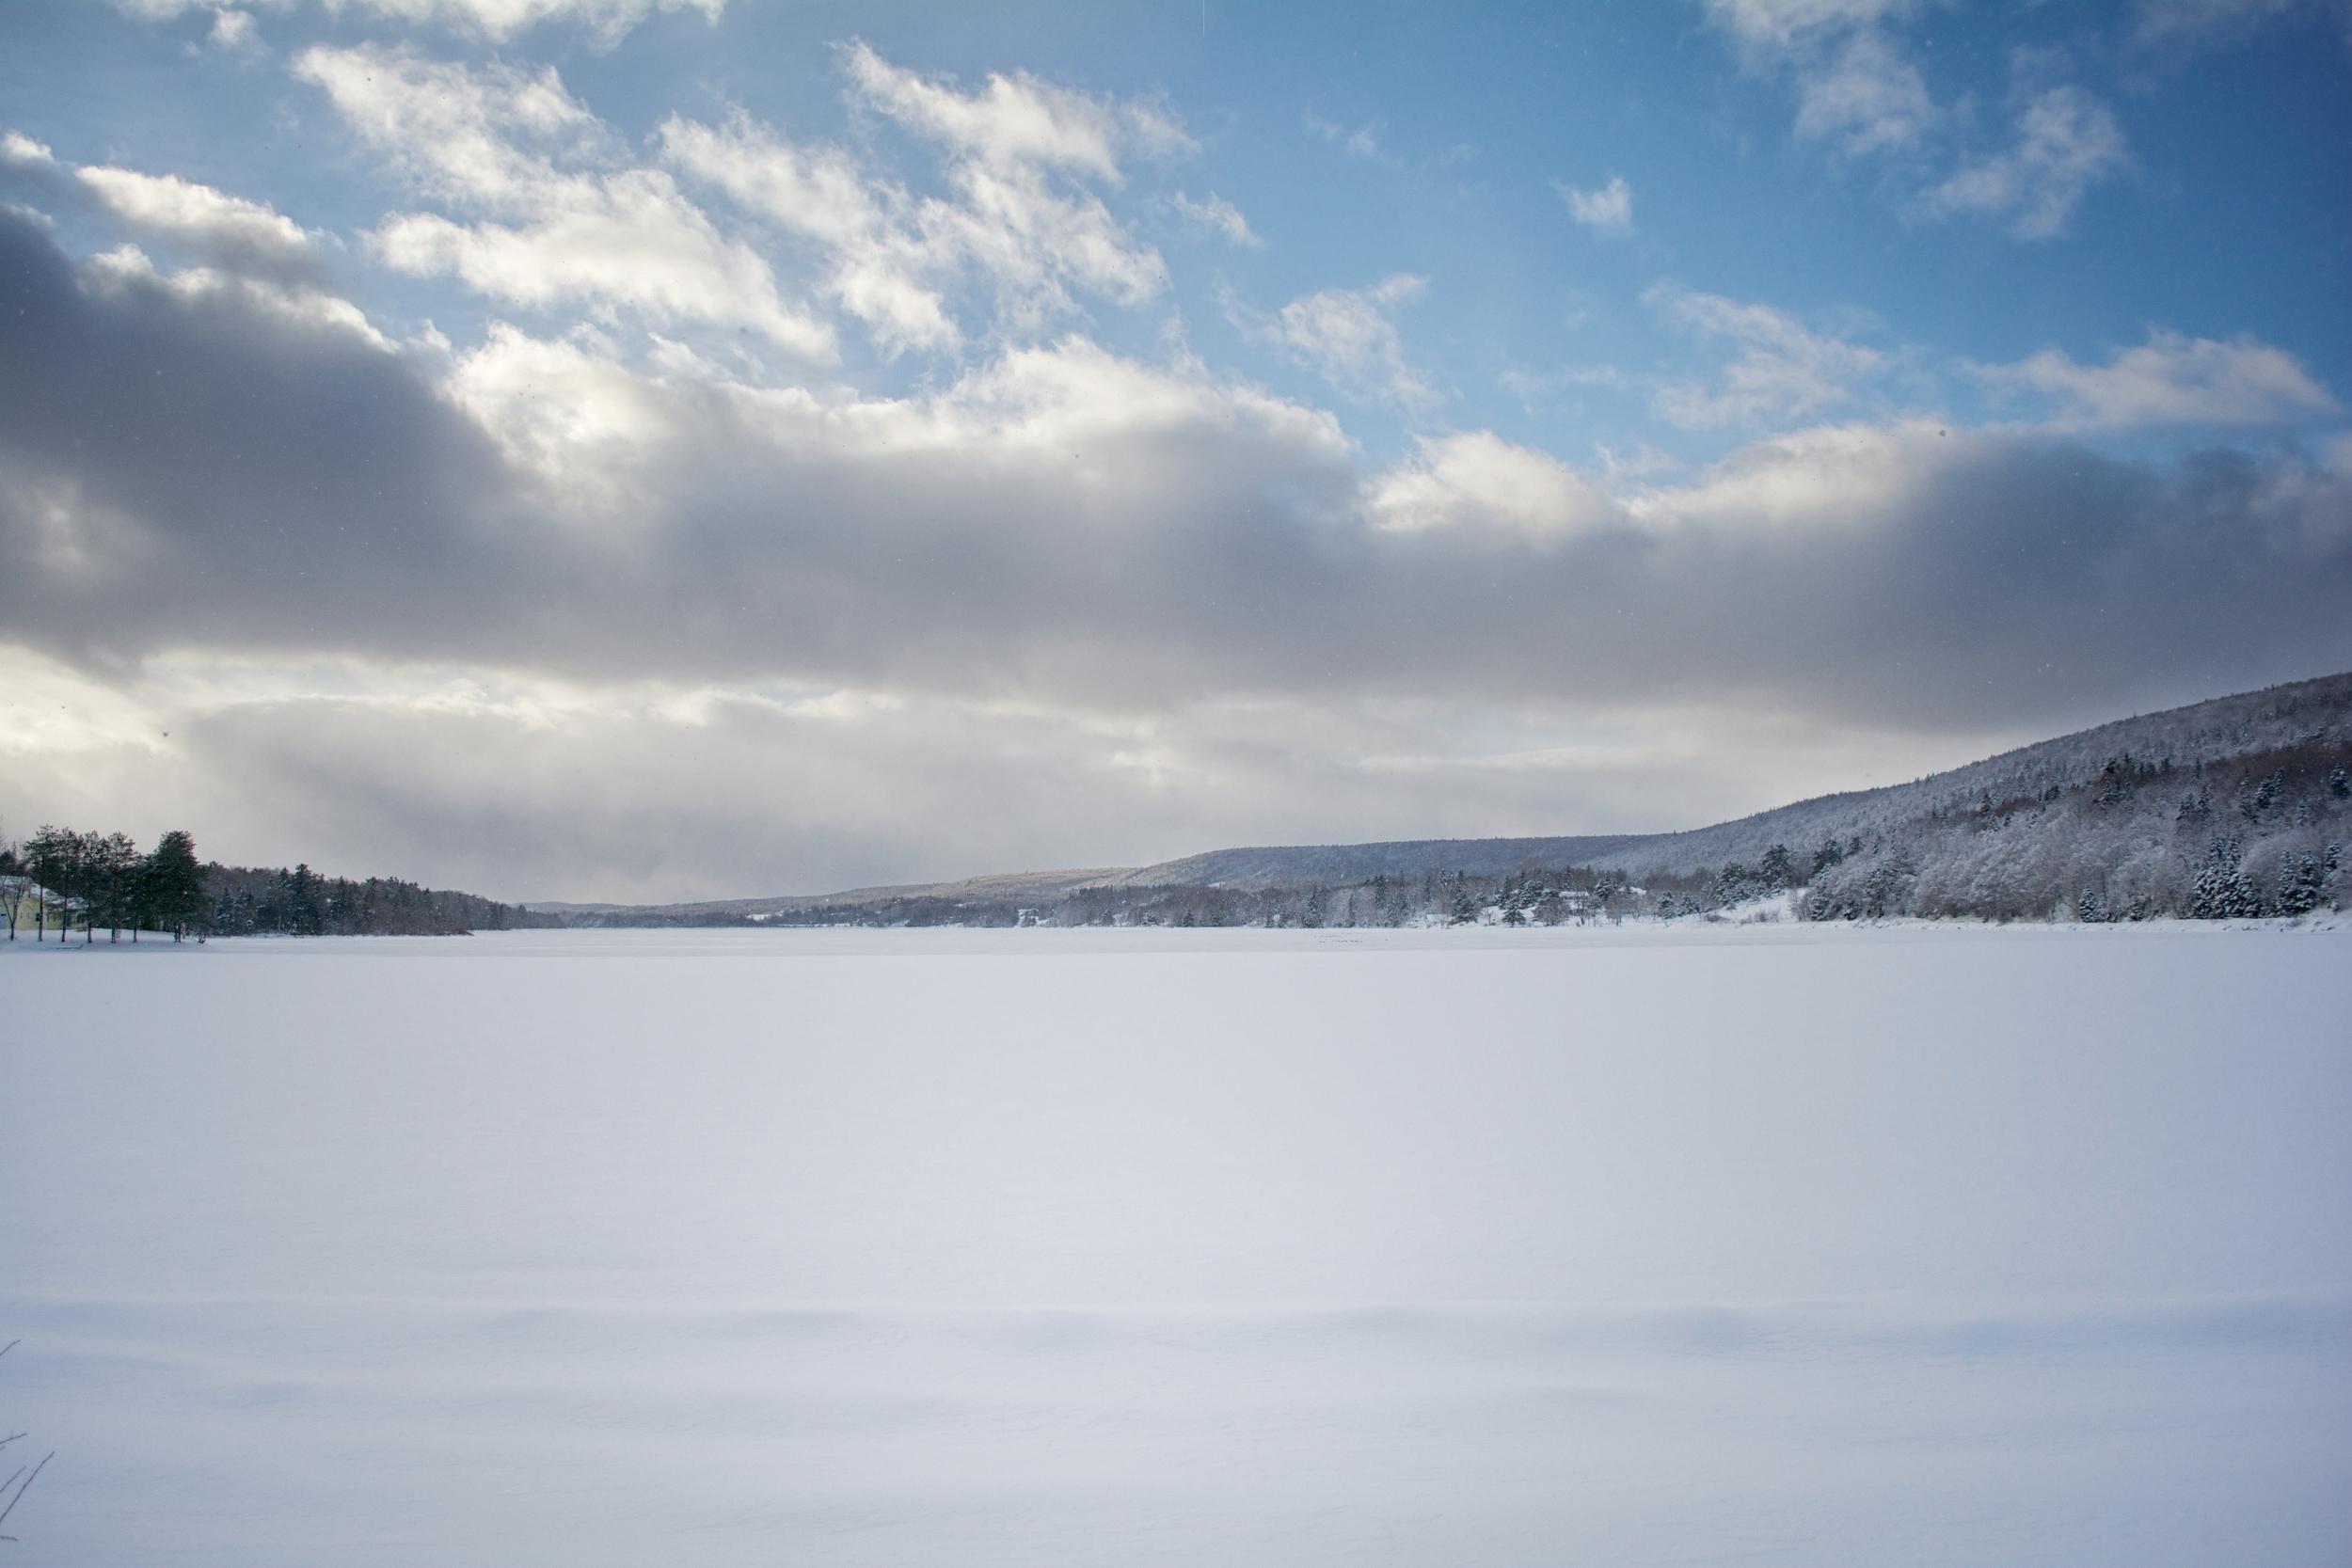 Blackett's Lake